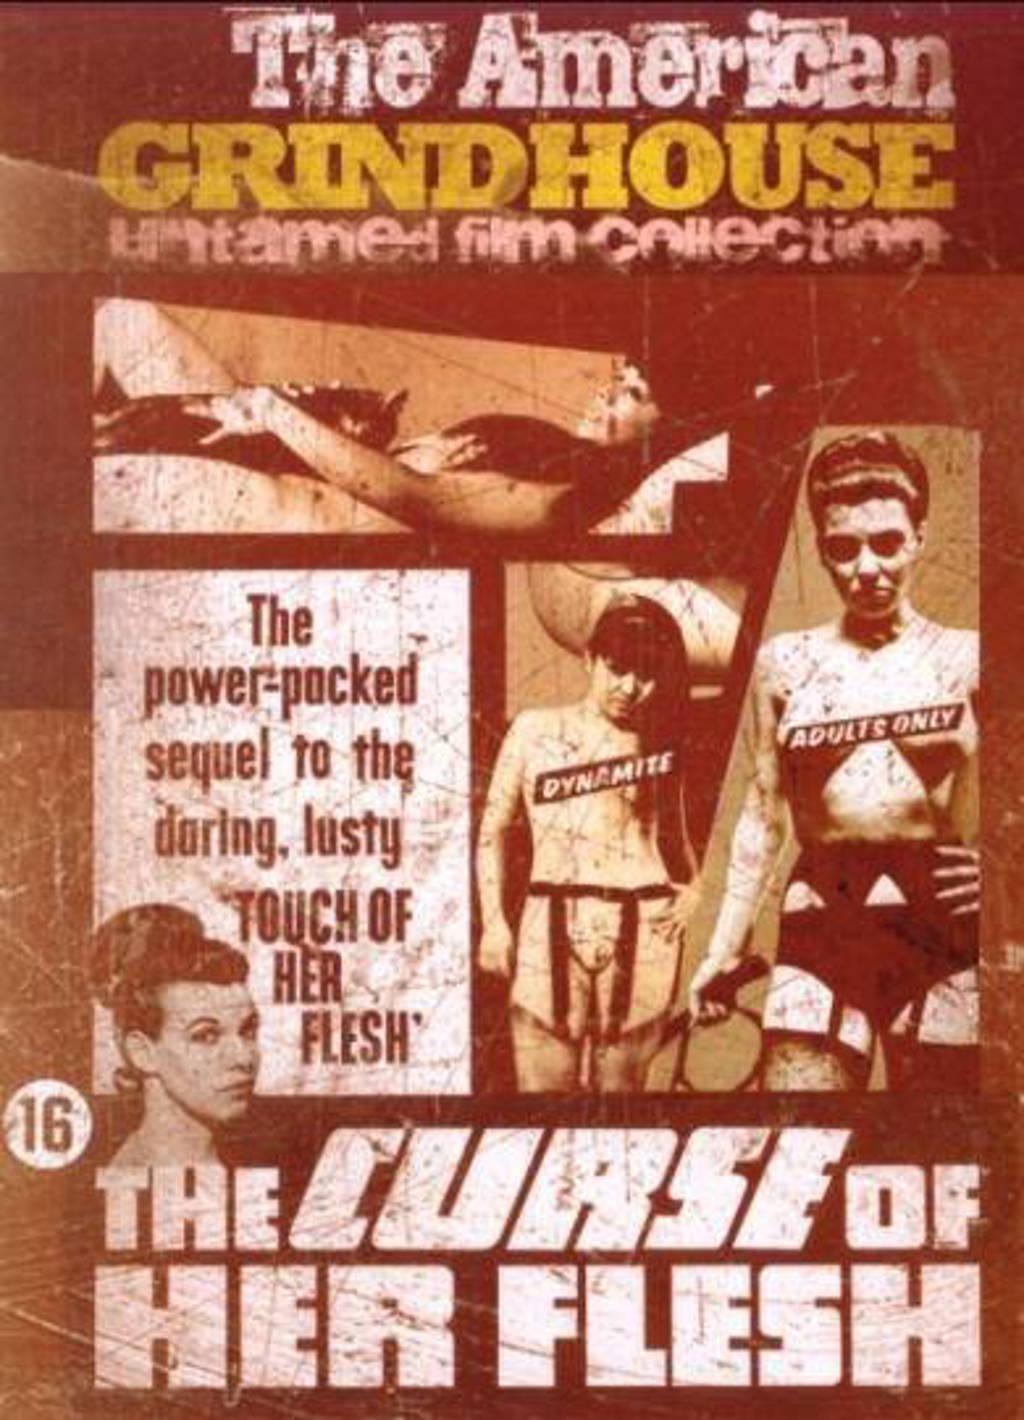 Curse of her flesh (DVD)